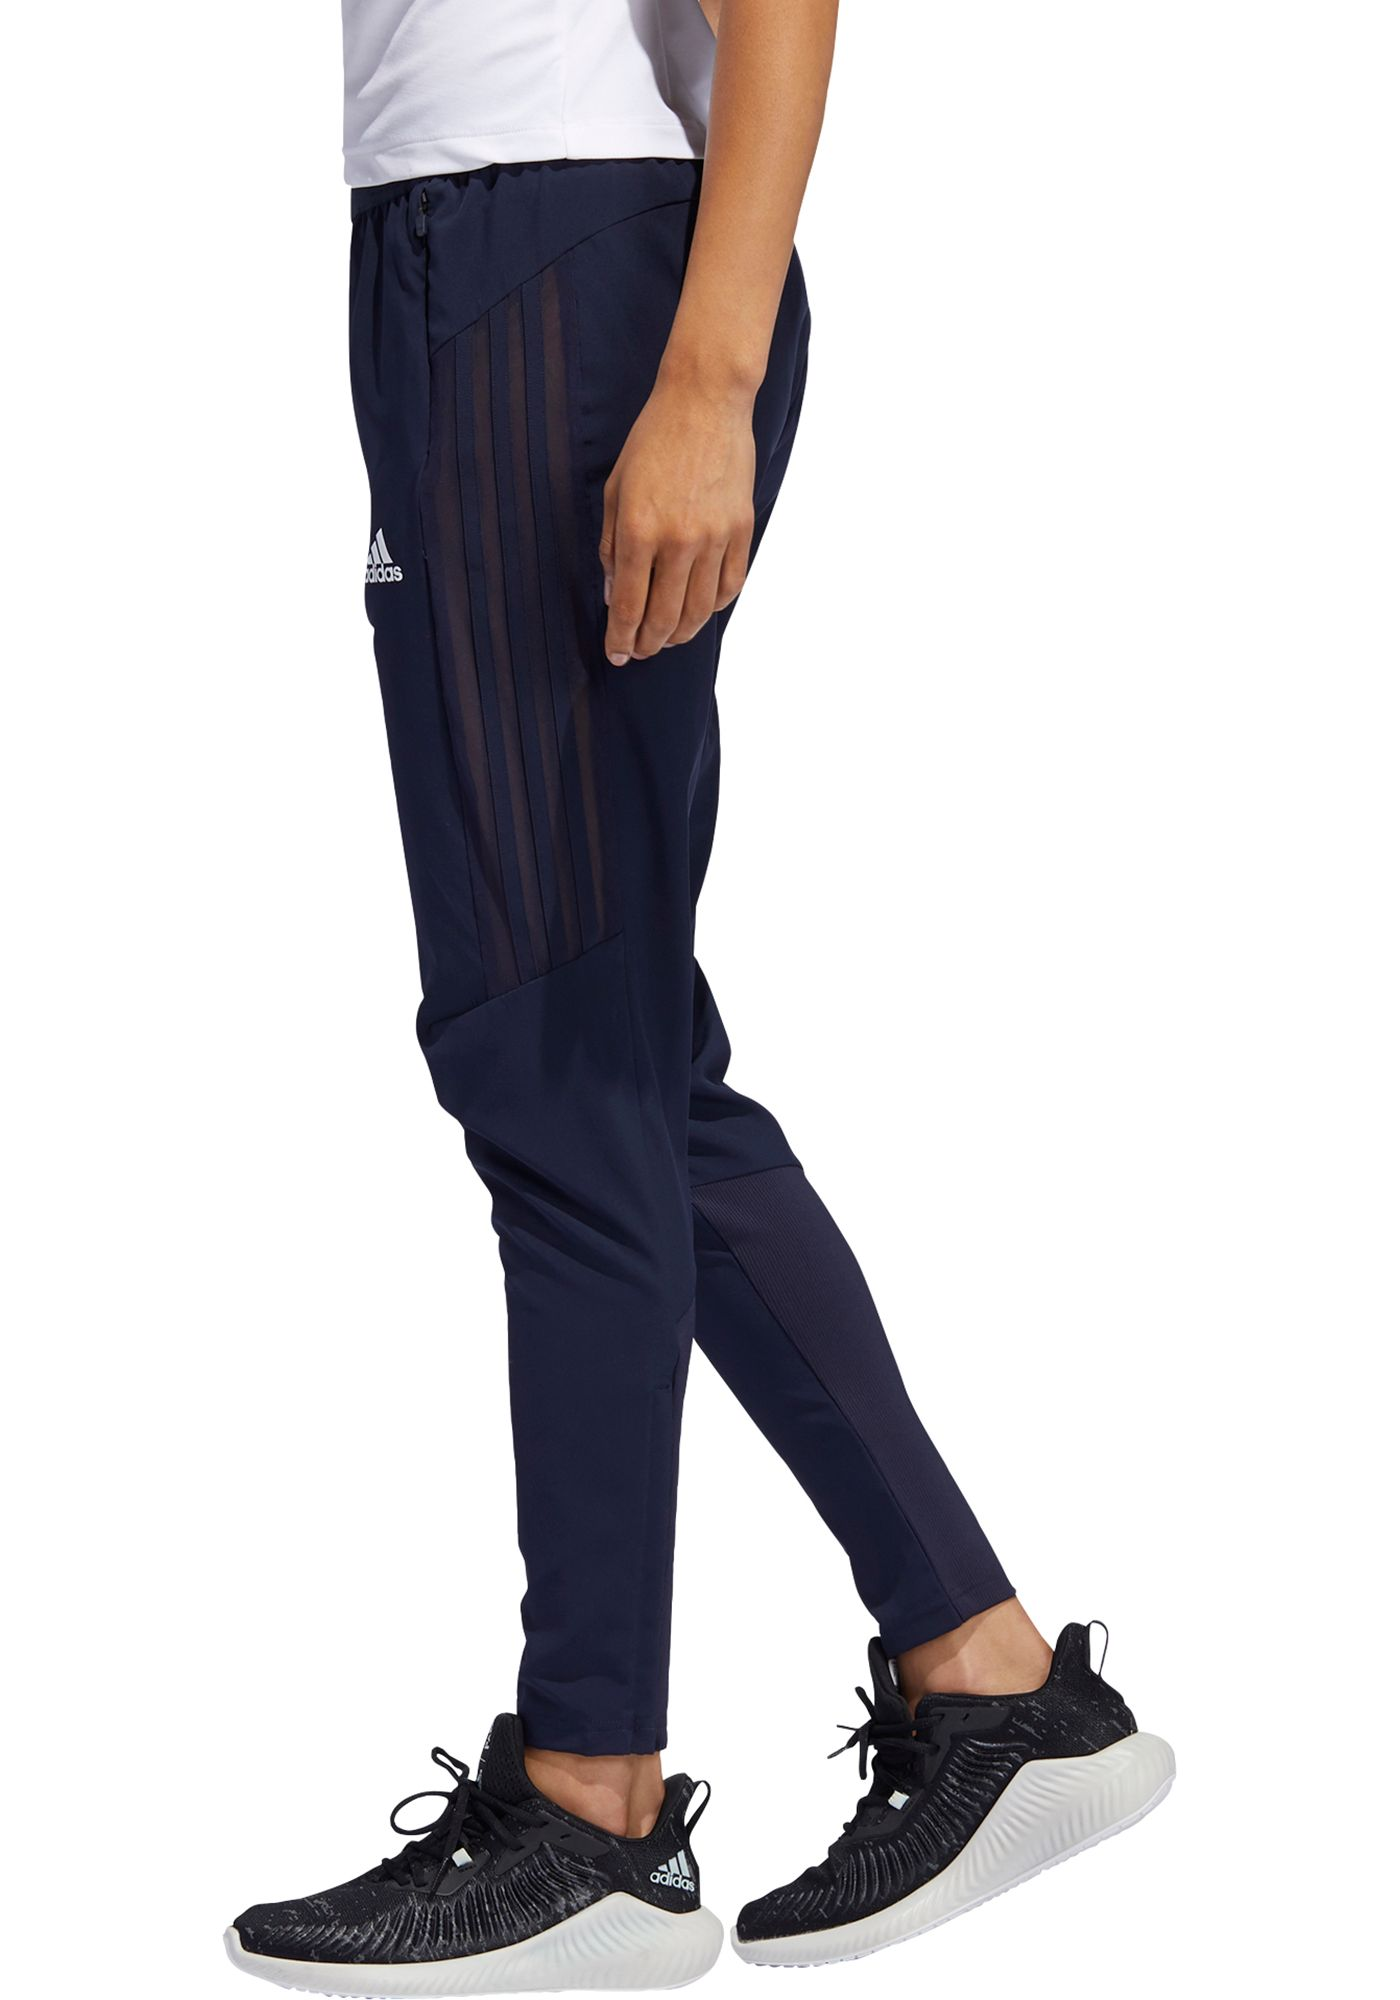 adidas Women's 3-Stripes Woven Training Pants